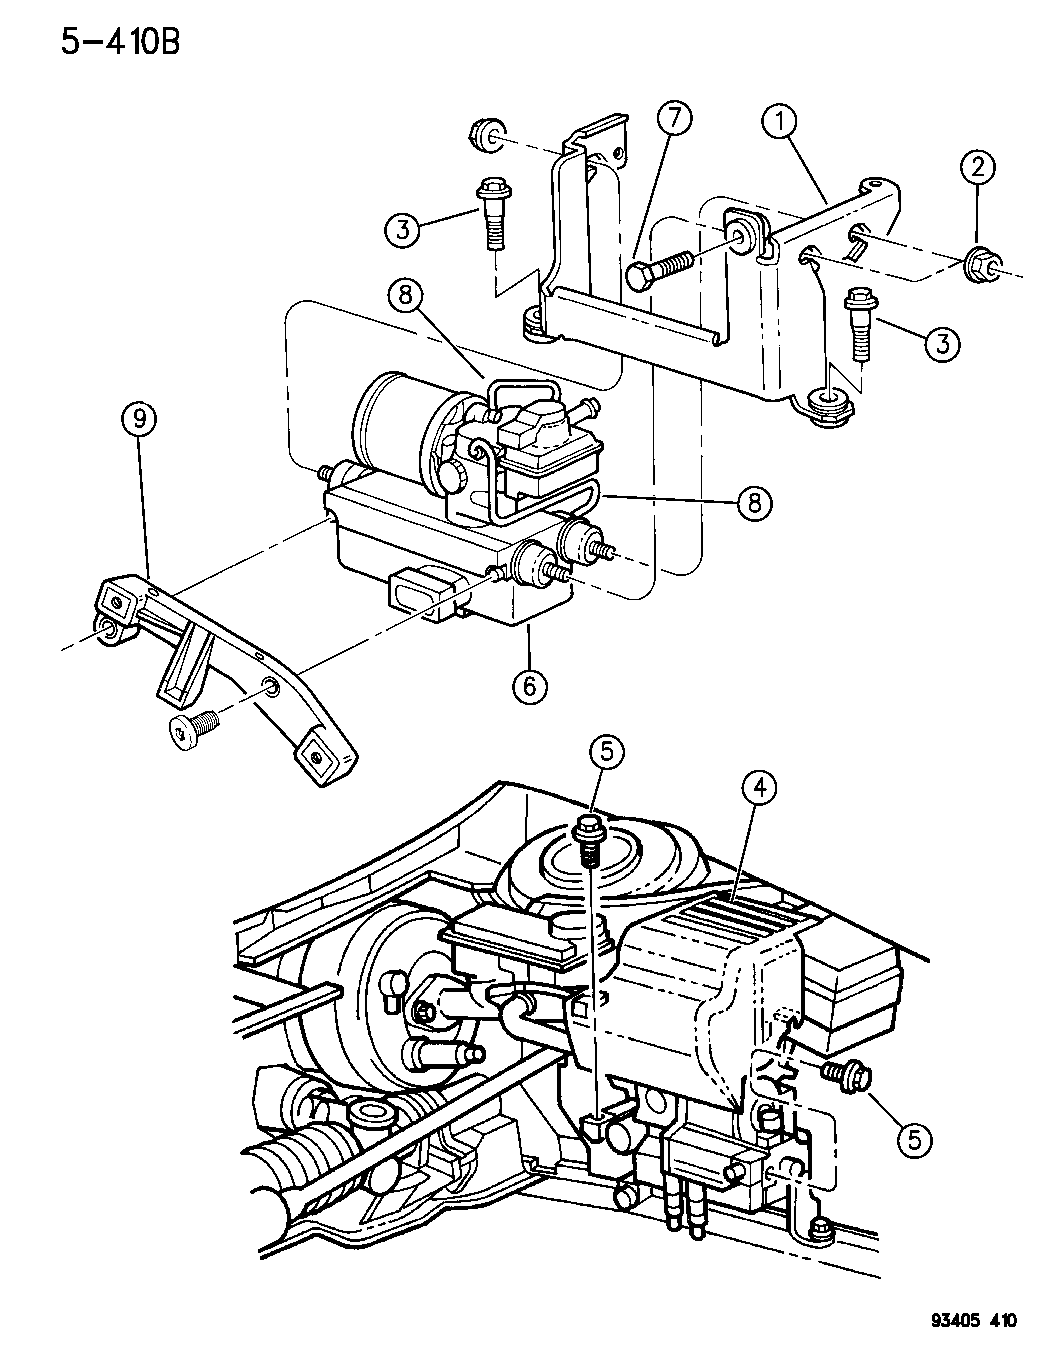 1996 Chrysler Concorde Hydraulic Control Unit Anti-Lock Brakes